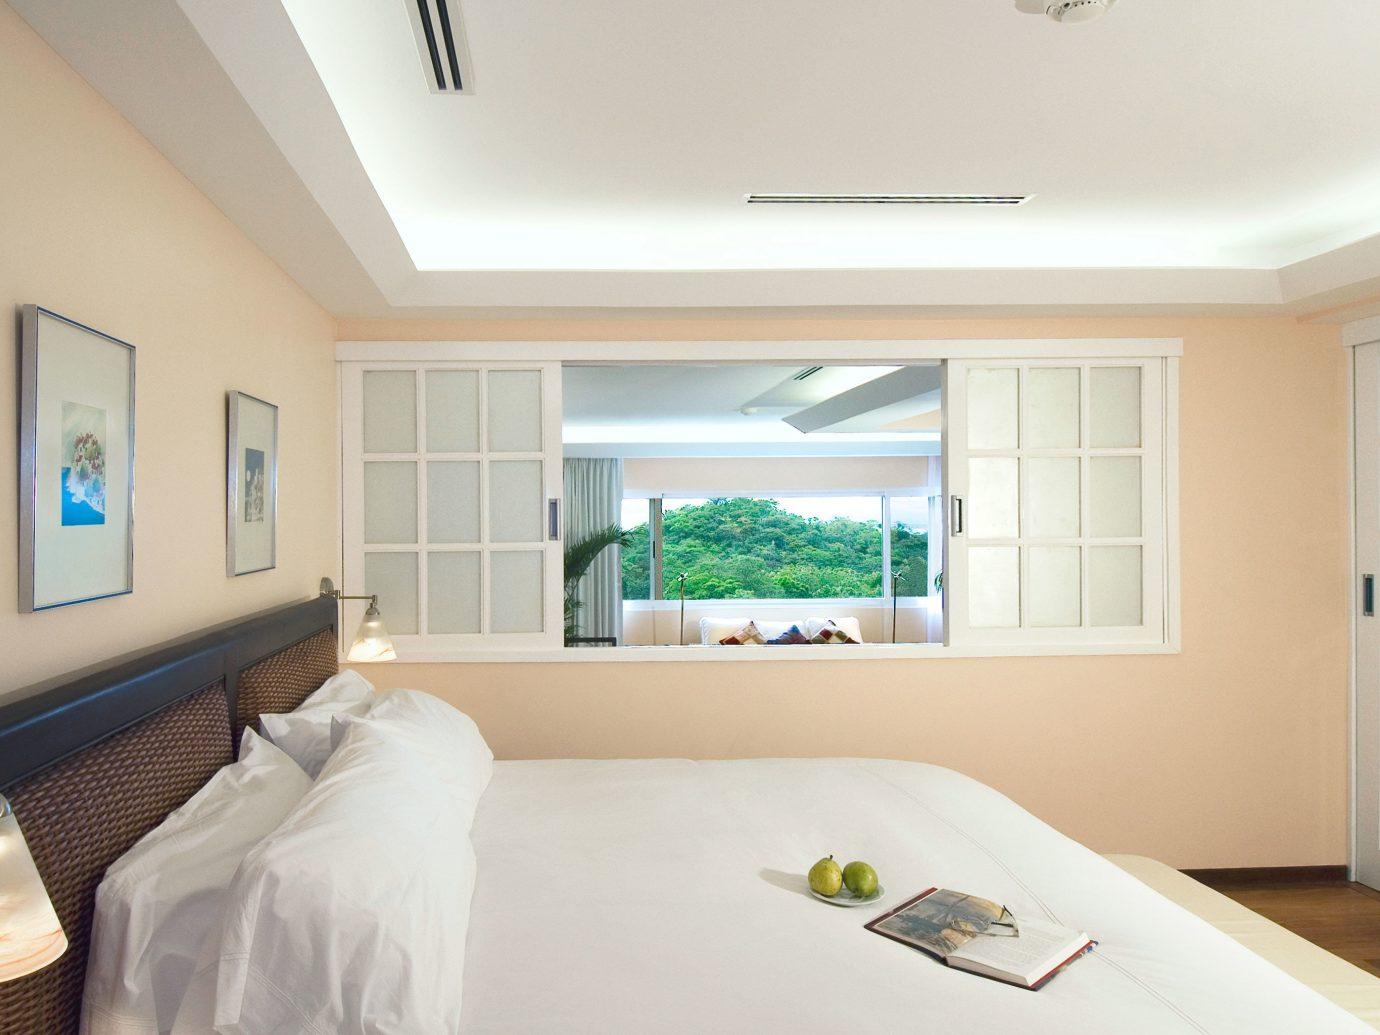 Gaia Hotel And Reserve Bedroom - Manuel Antonio, Costa Rica